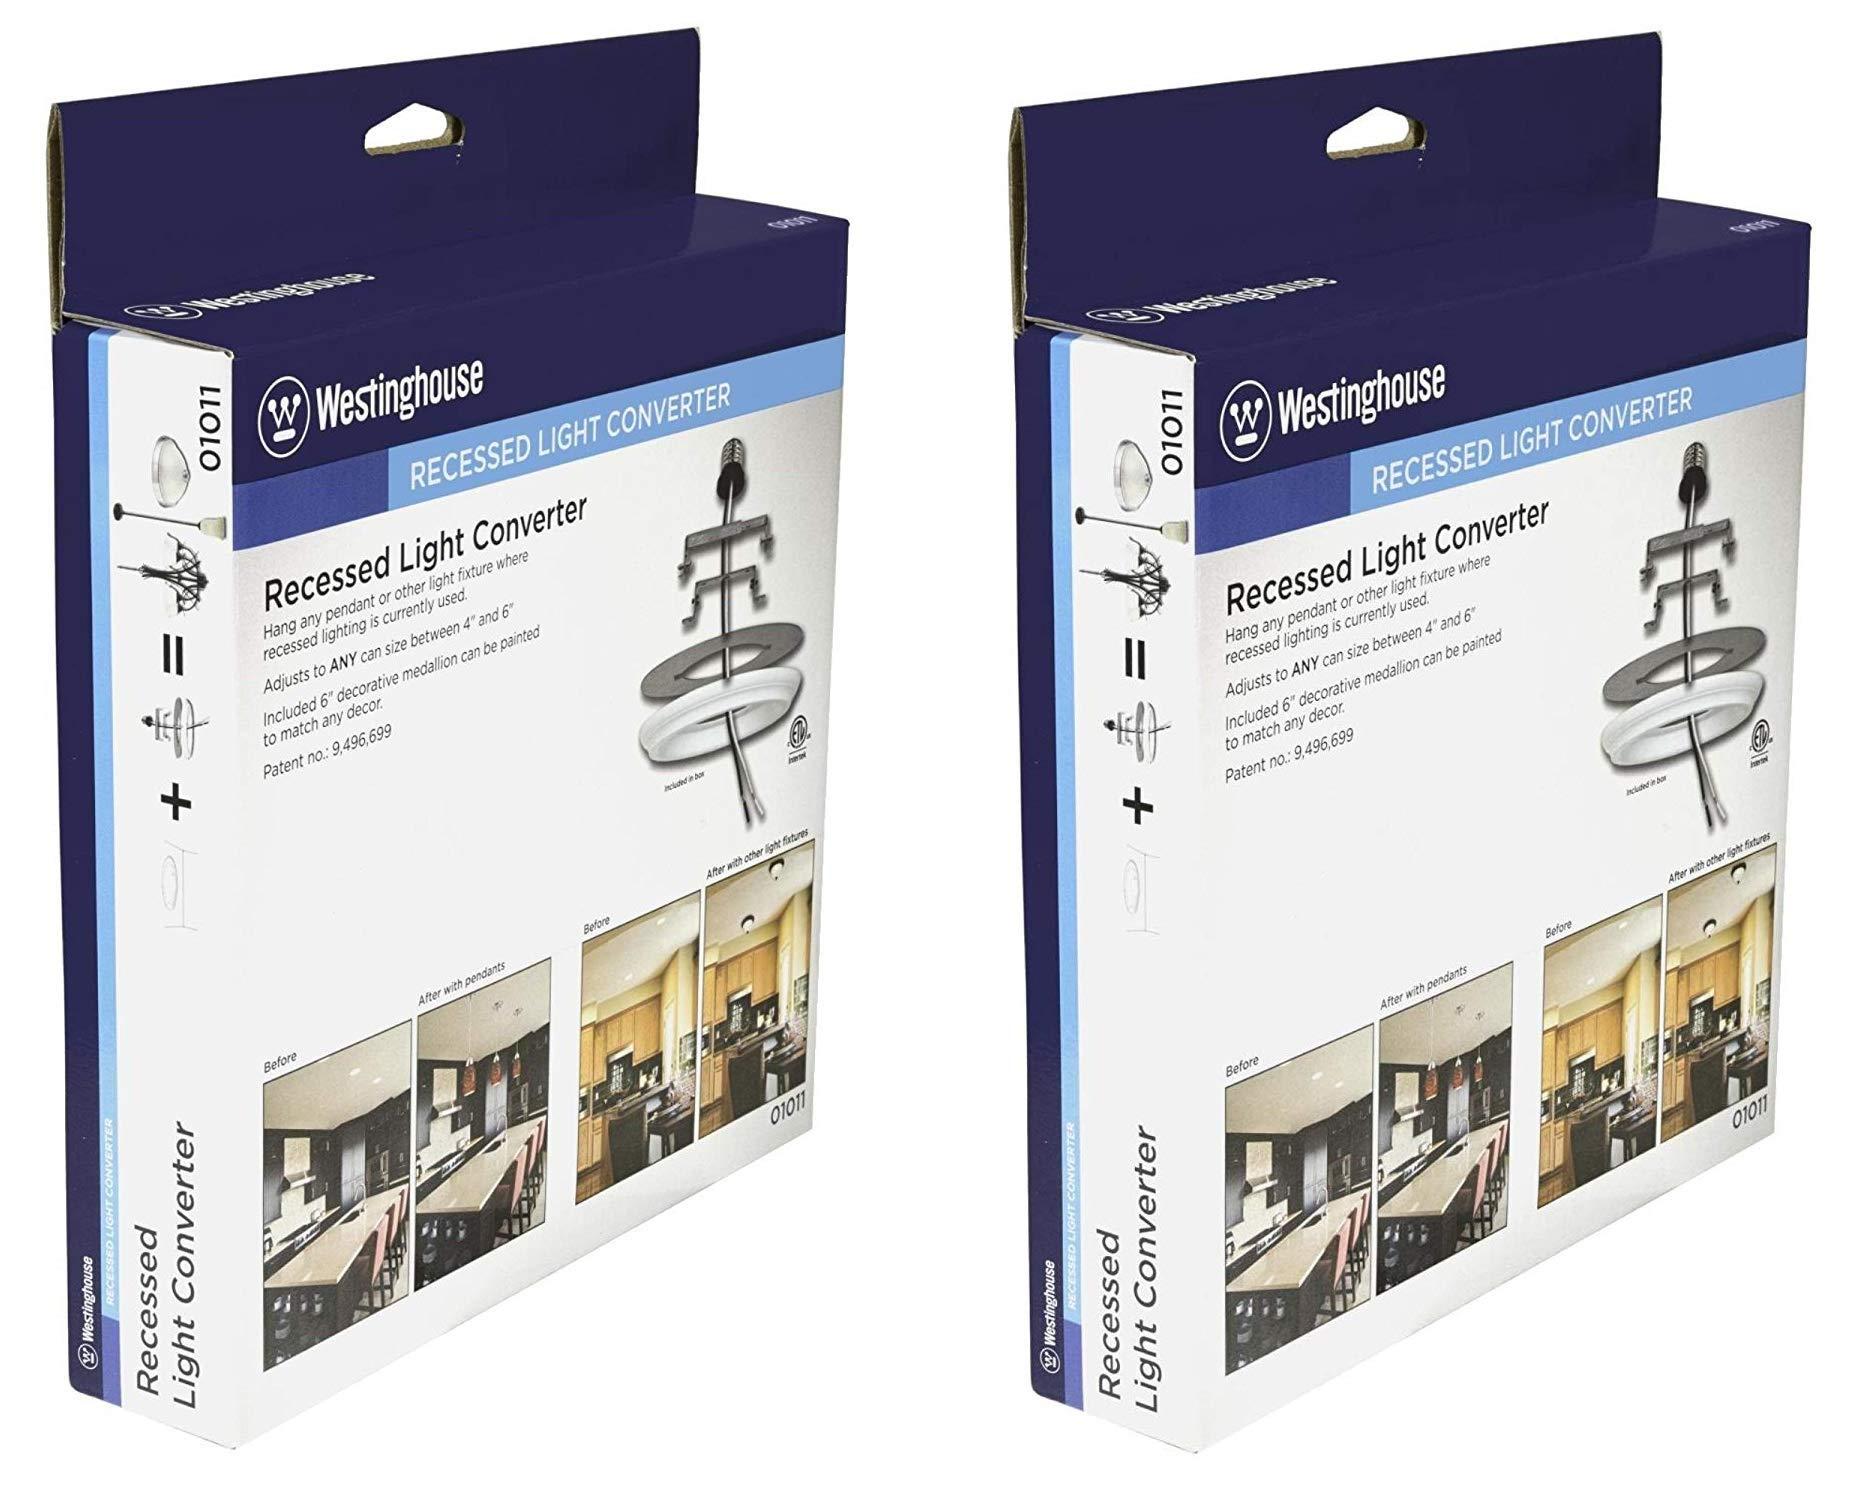 Westinghouse 0101100 Recessed Light Converter - 2 Pack